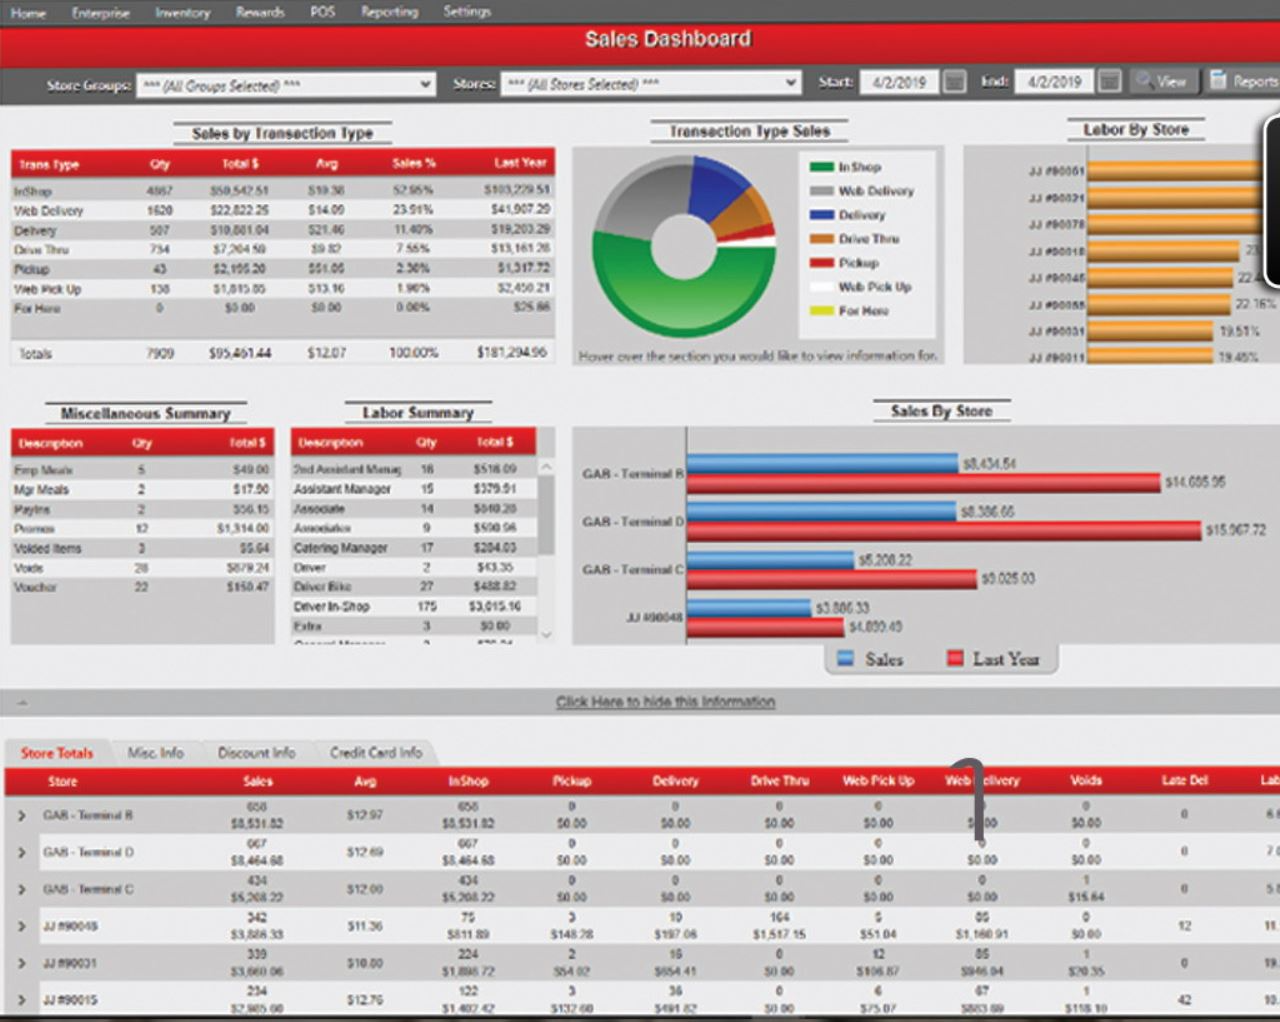 Casino & Hospitality POS System sales dashboard